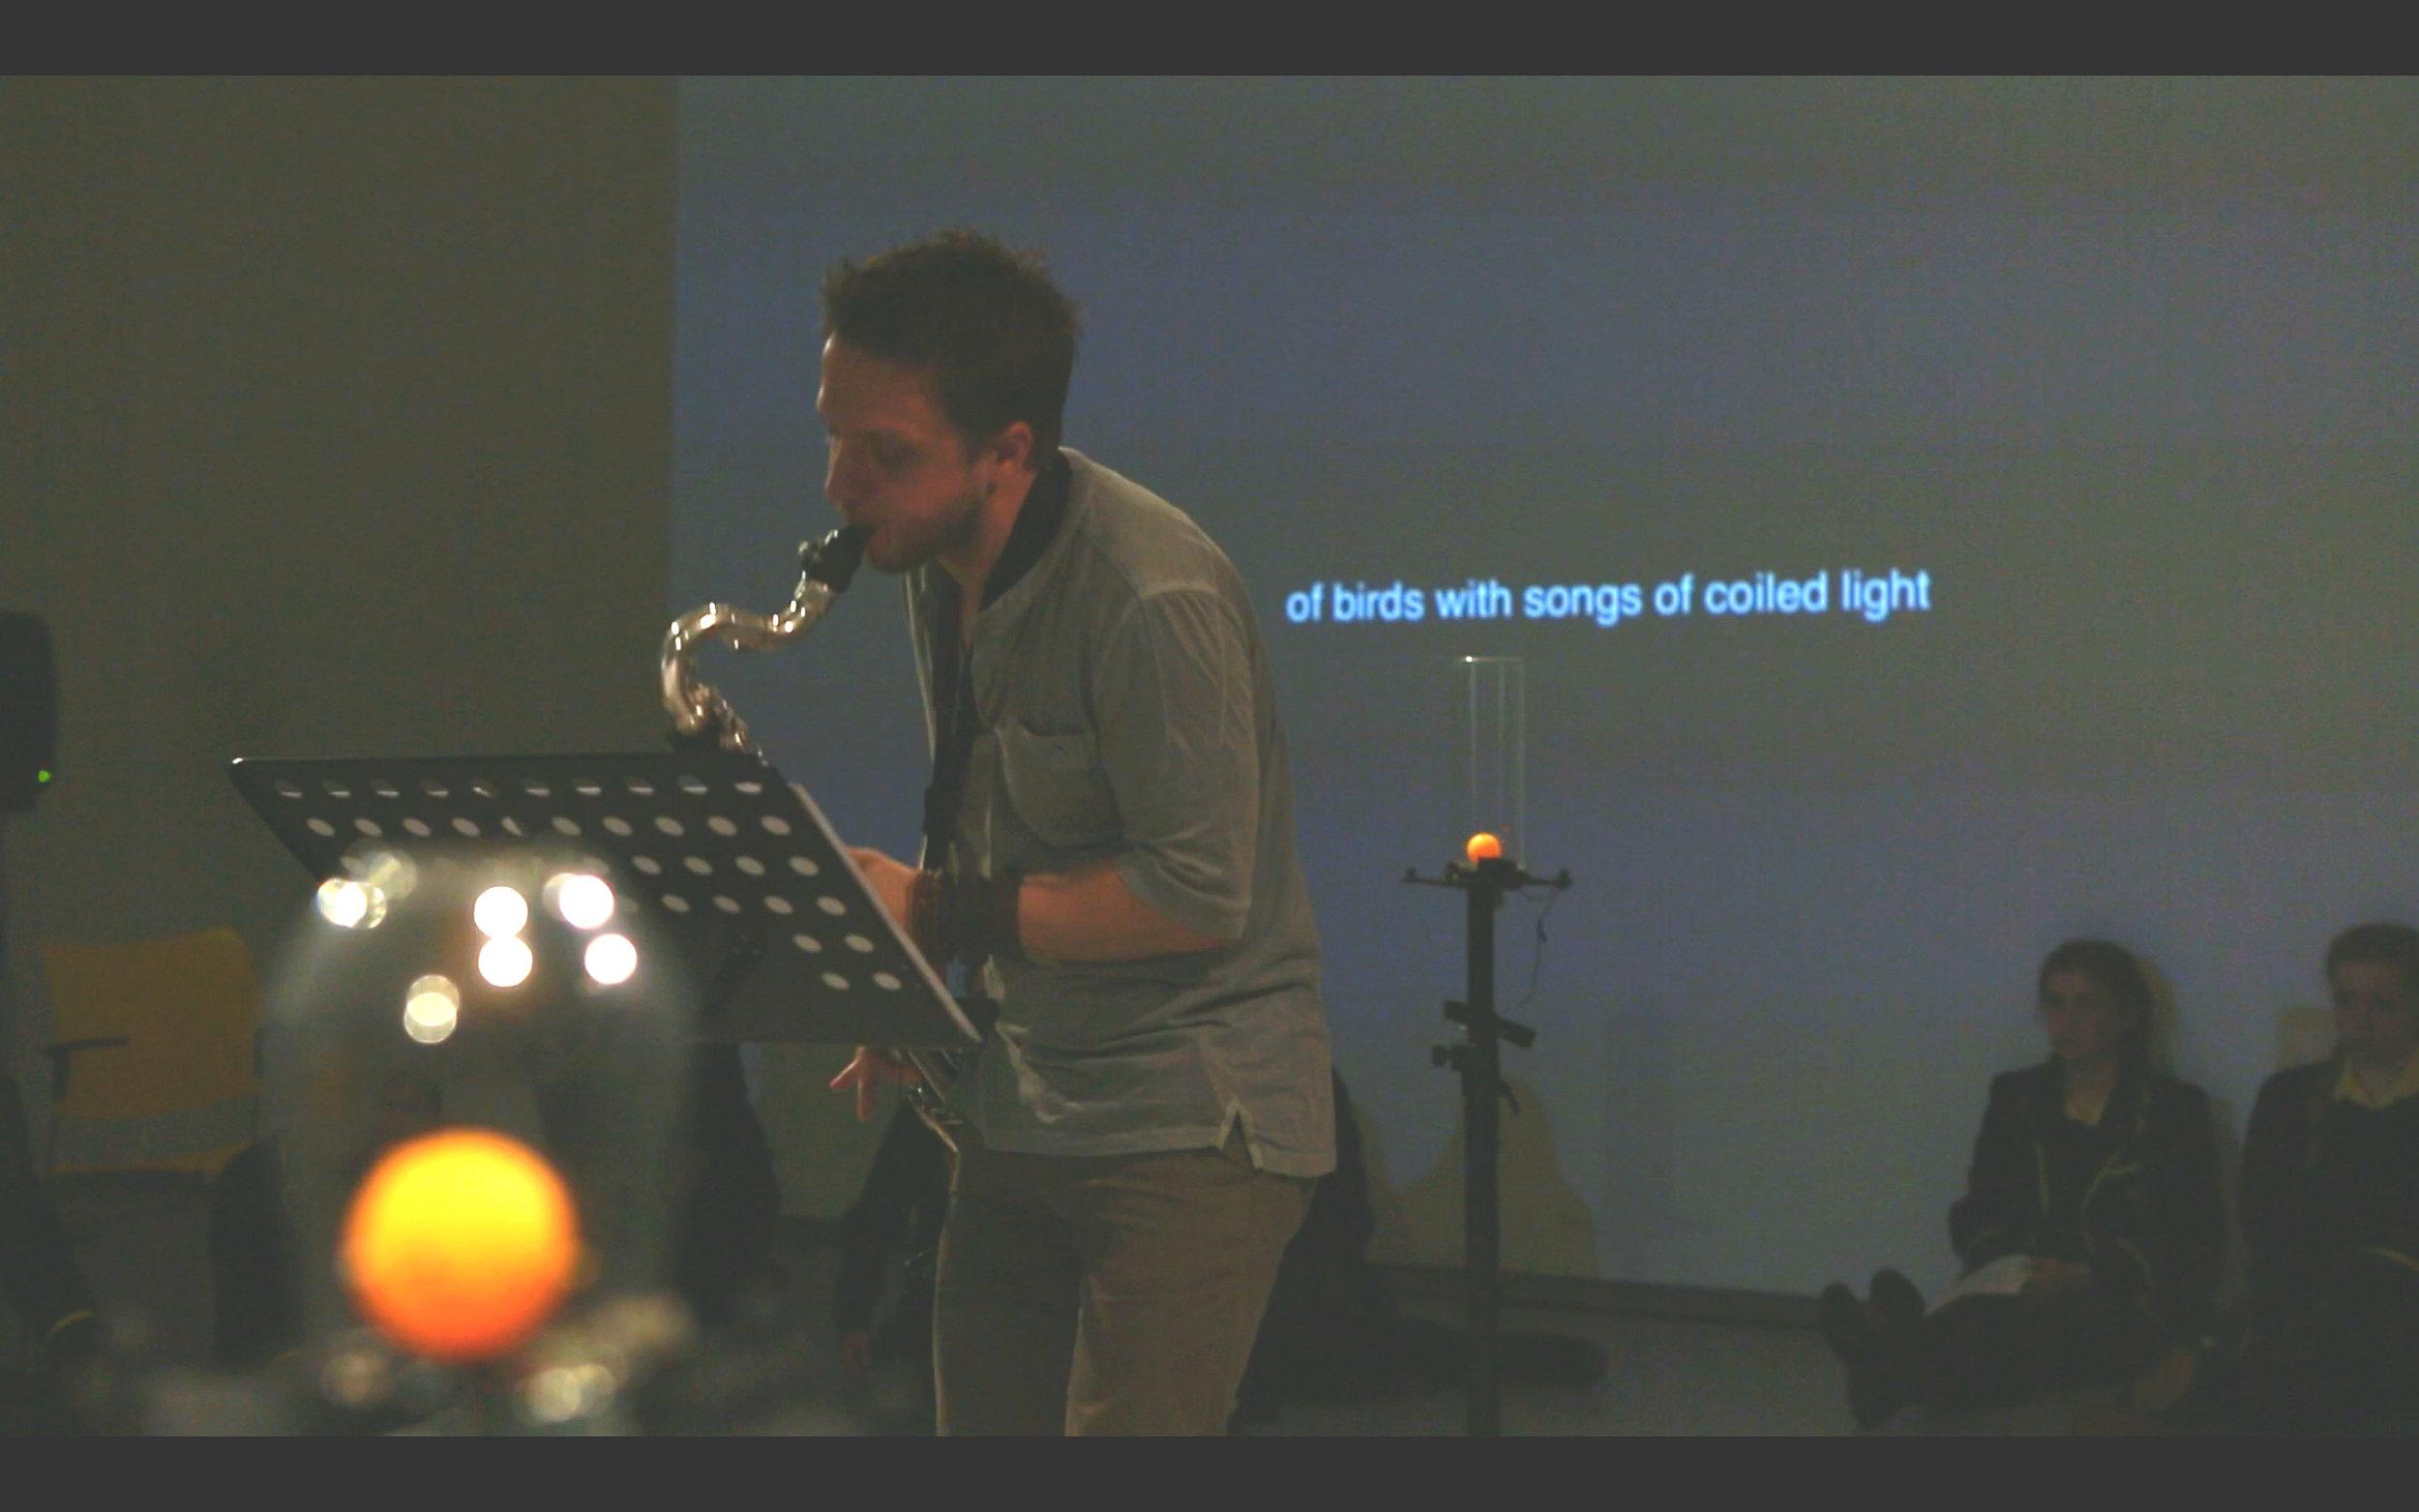 Songs of Coiled Light Promo pic 1.jpg